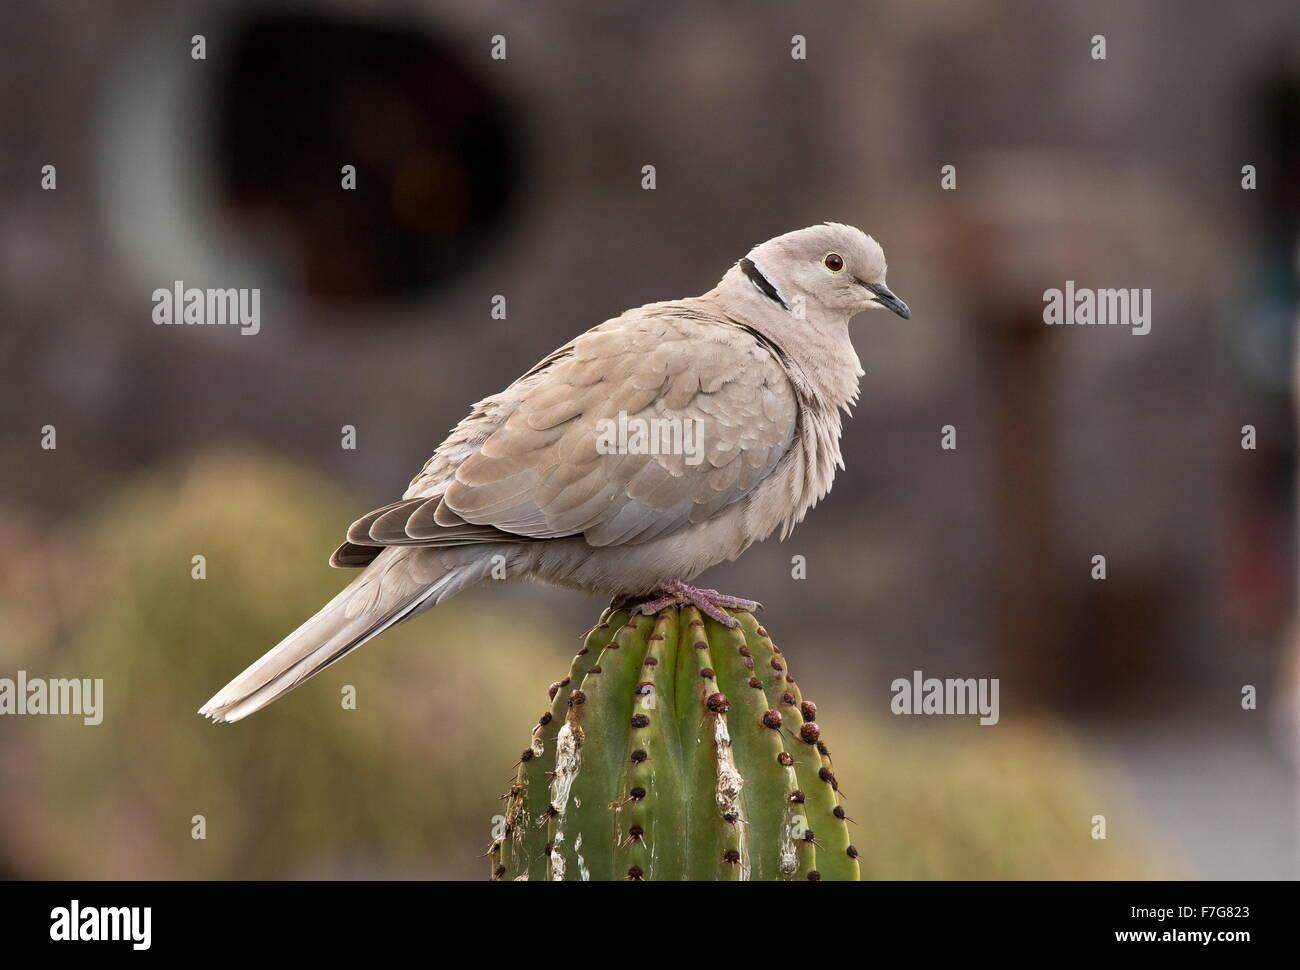 Eurasian collared dove, Streptopelia decaocto, on cactus, Lanzarote. Stock Photo